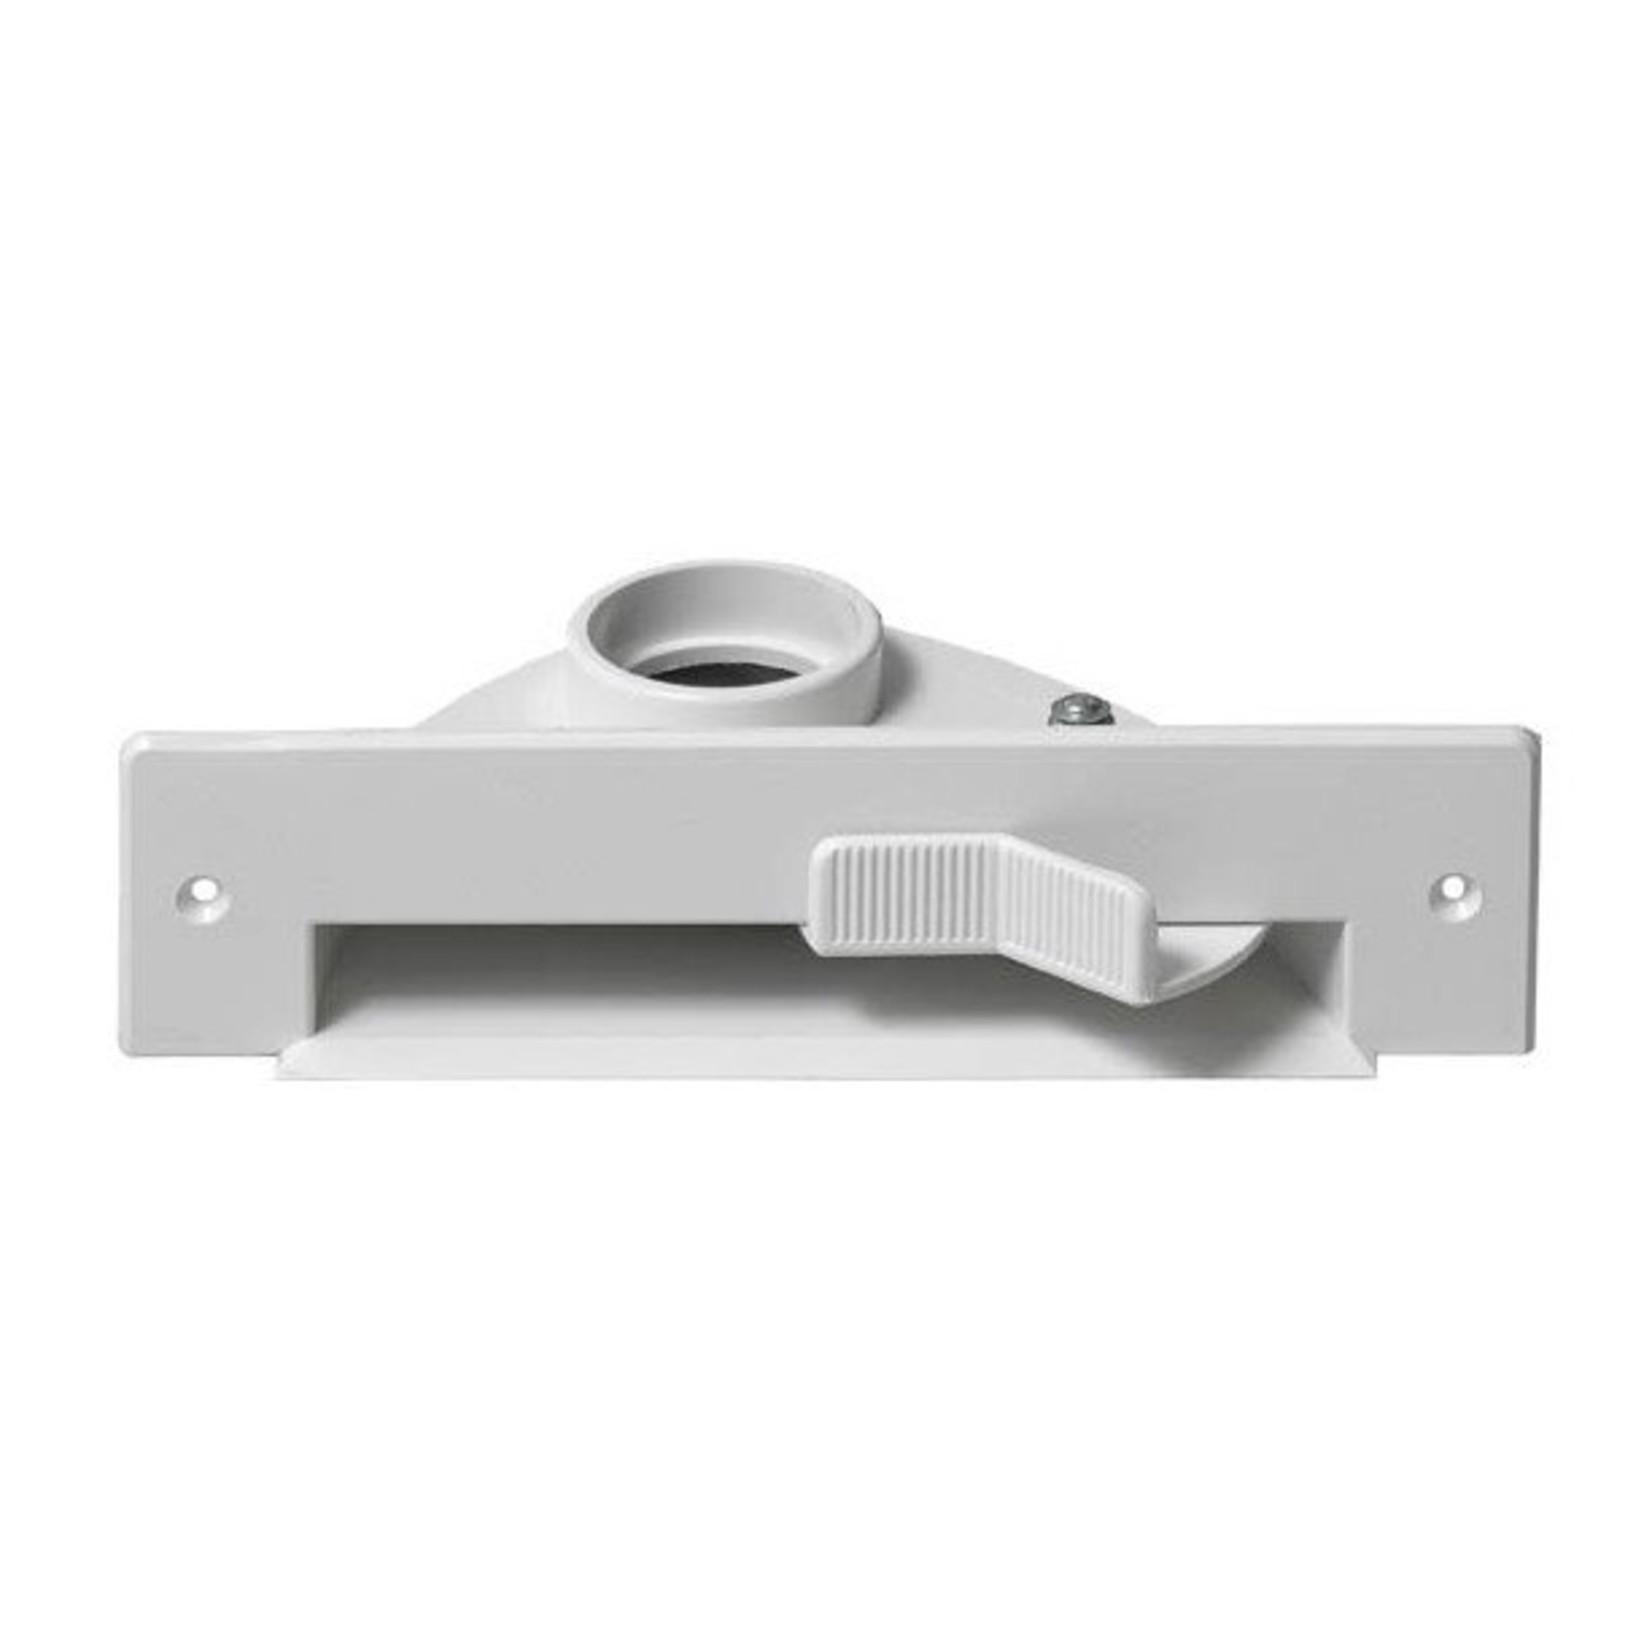 Plastiflex Central Vacuum VacPan Automatic Dustpan - White